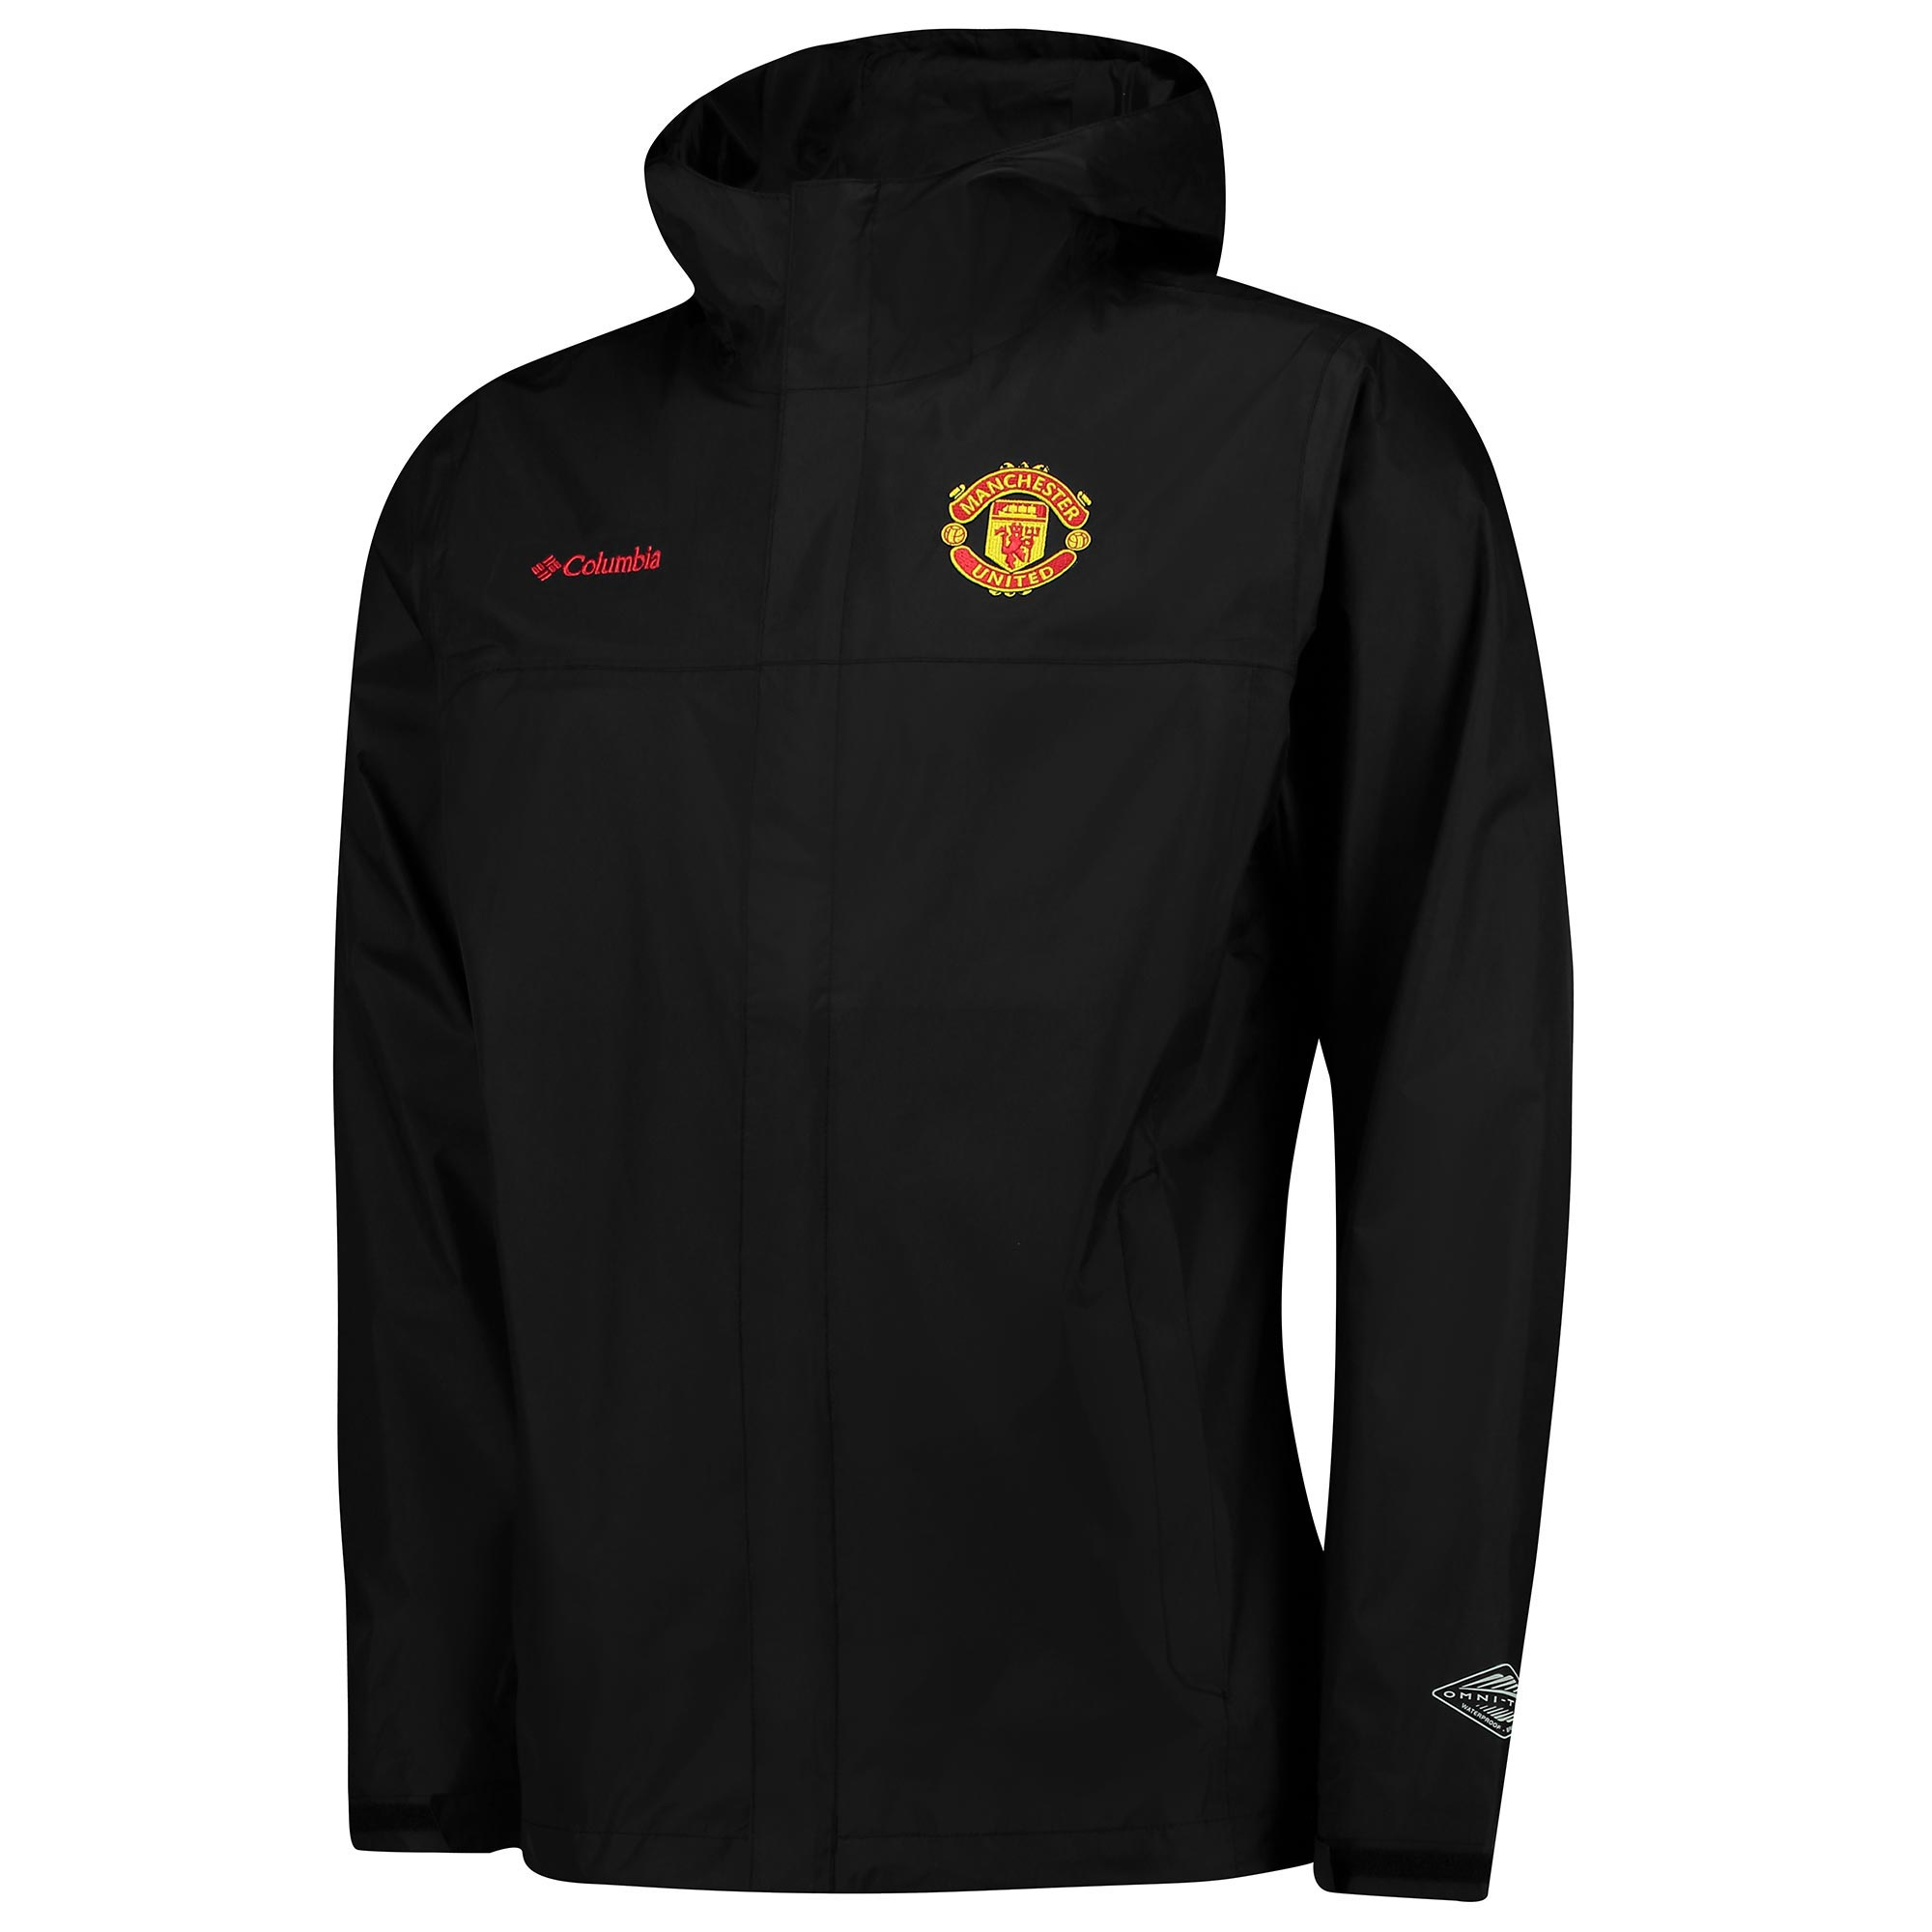 Manchester United Columbia Watertight Jacket - Black - Mens